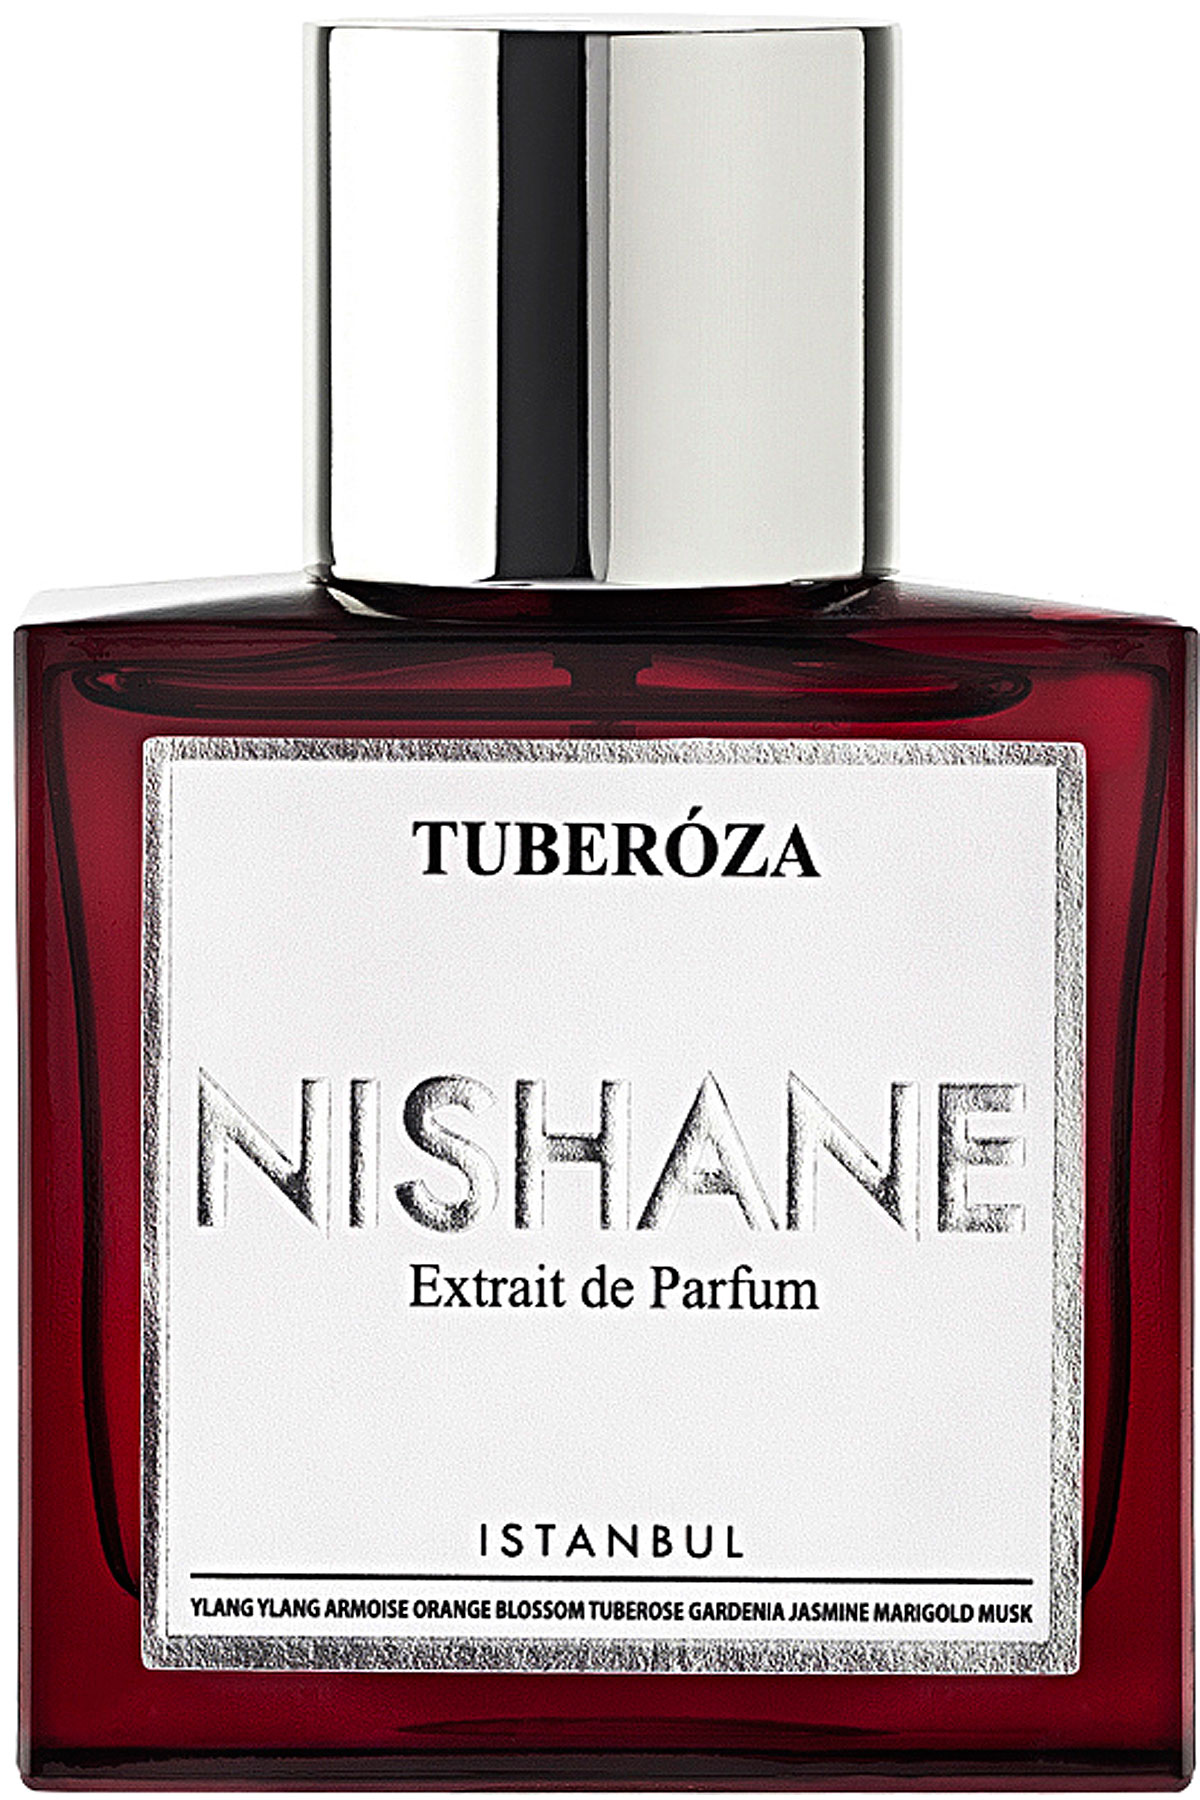 Nishane Fragrances for Women, Tuberoza - Extrait De Parfum - 50 Ml, 2019, 50 ml